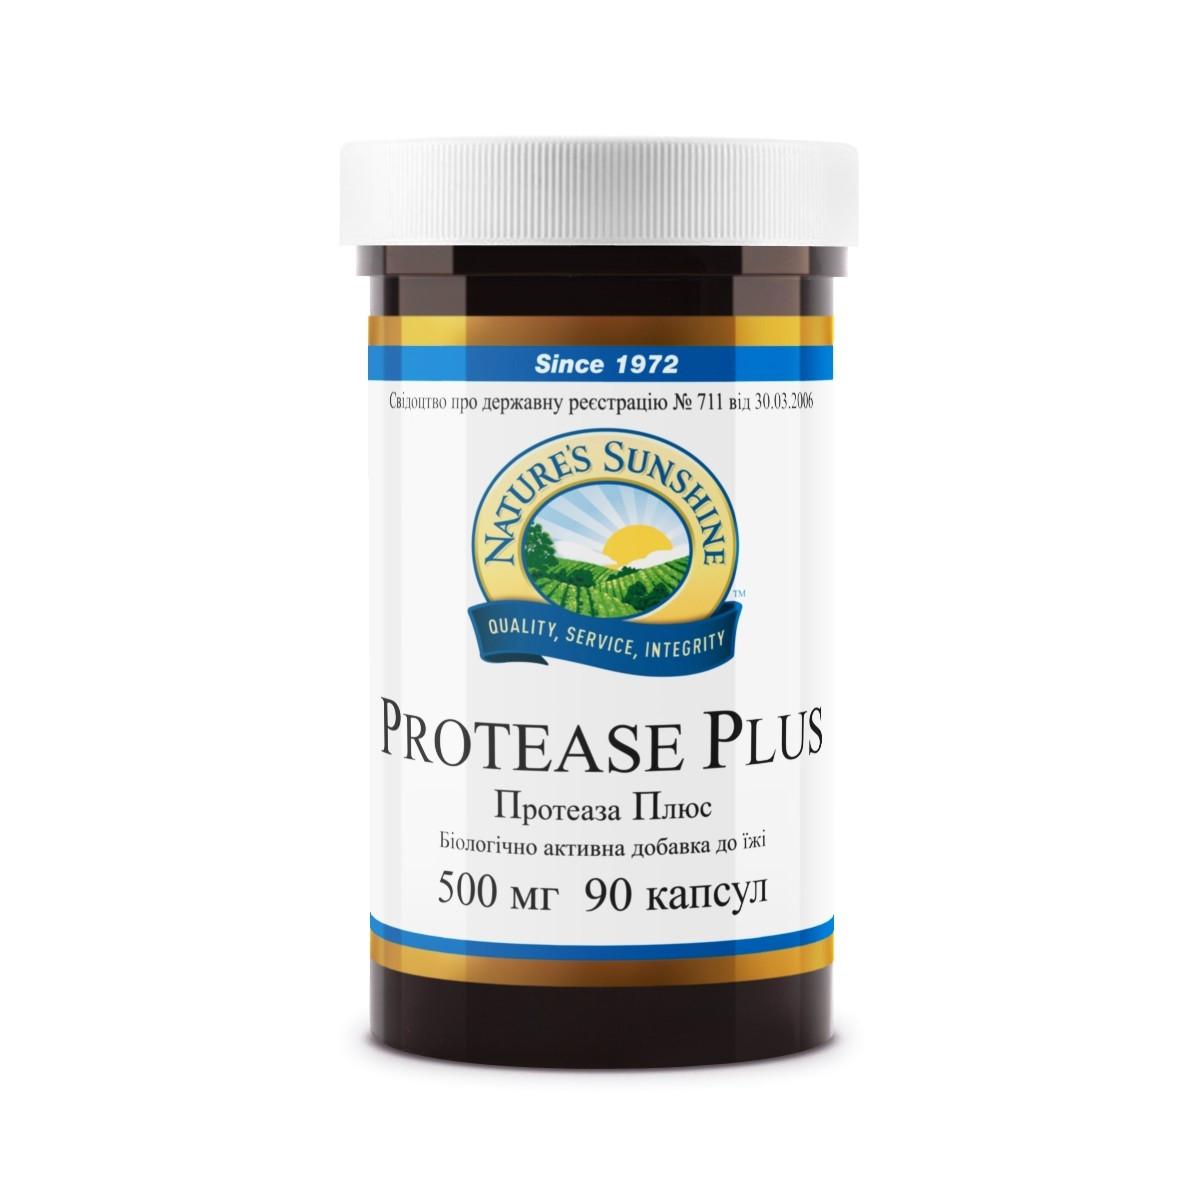 Protease Plus Протеаза Плюс, NSP, США, НСП. Для ферментации белков в организме, ЖКТ.